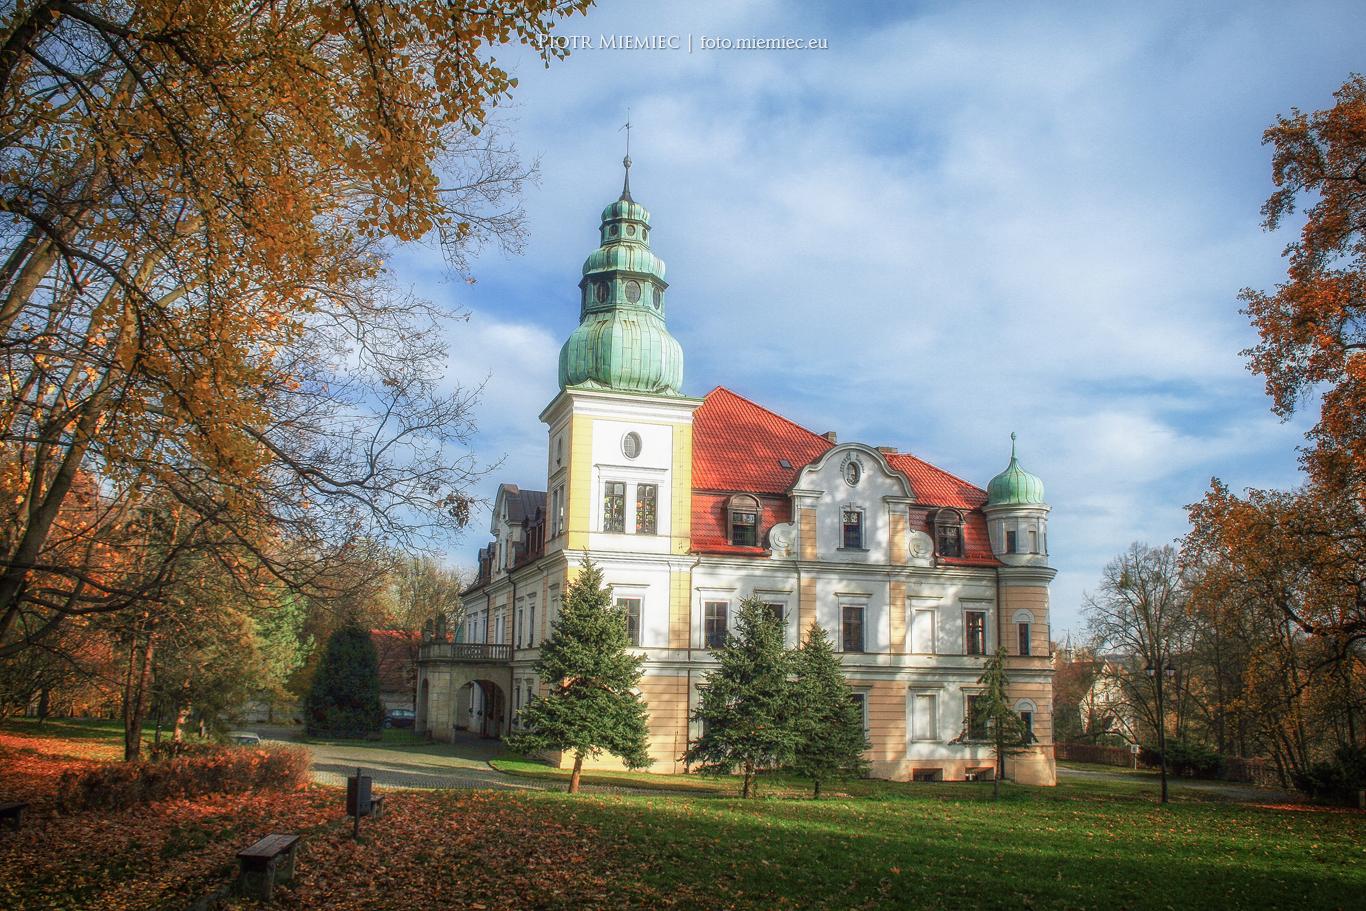 Pałac Kamieniec - 9